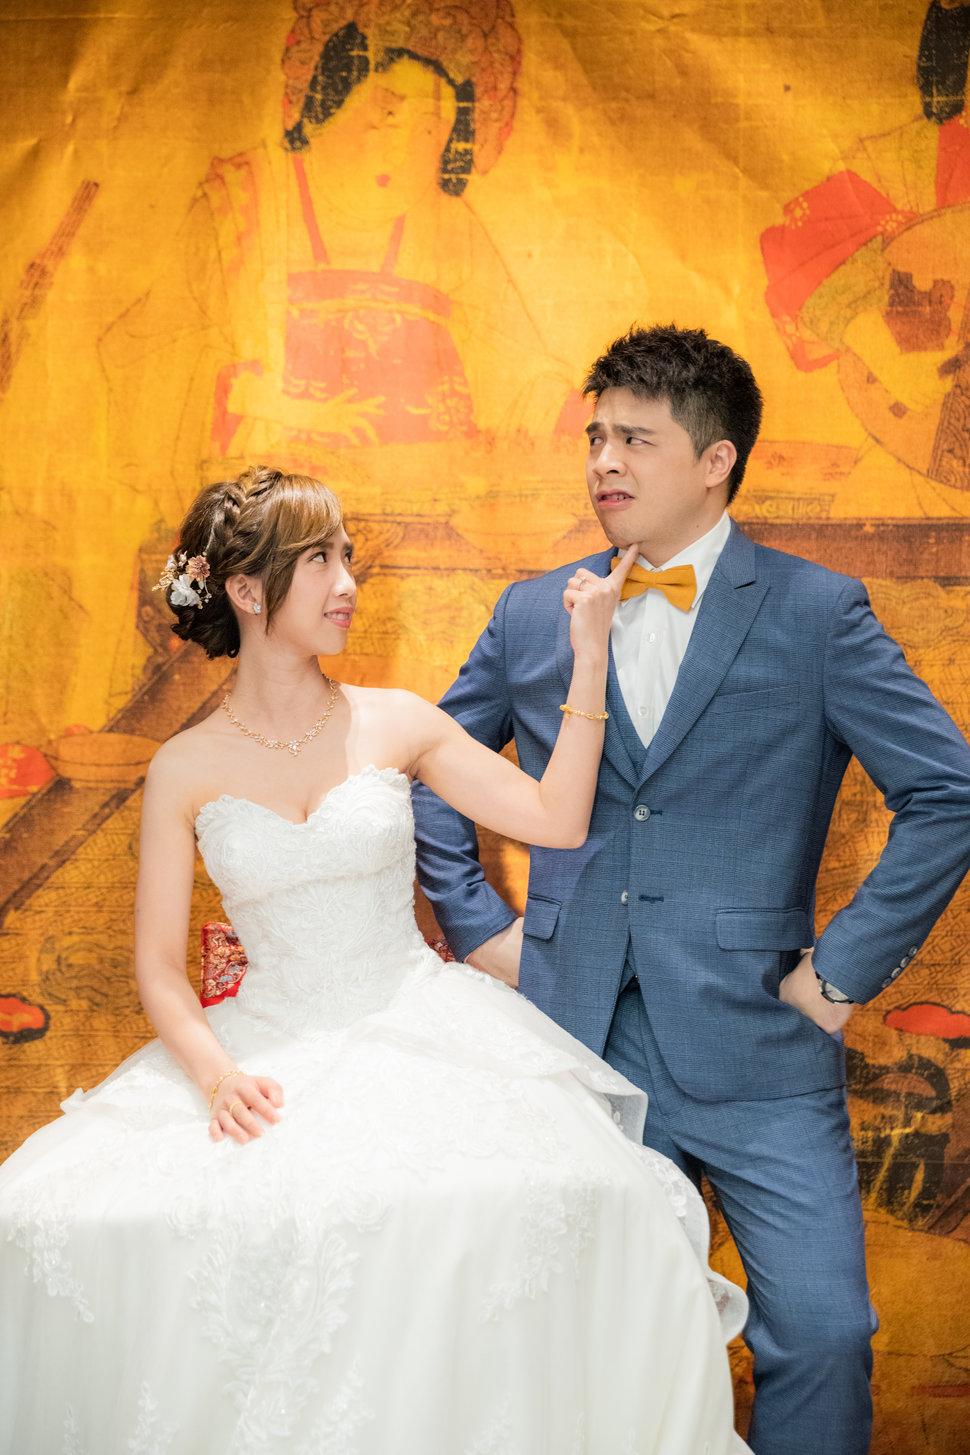 0923-18 - 達特瑋攝影Wei Photography《結婚吧》